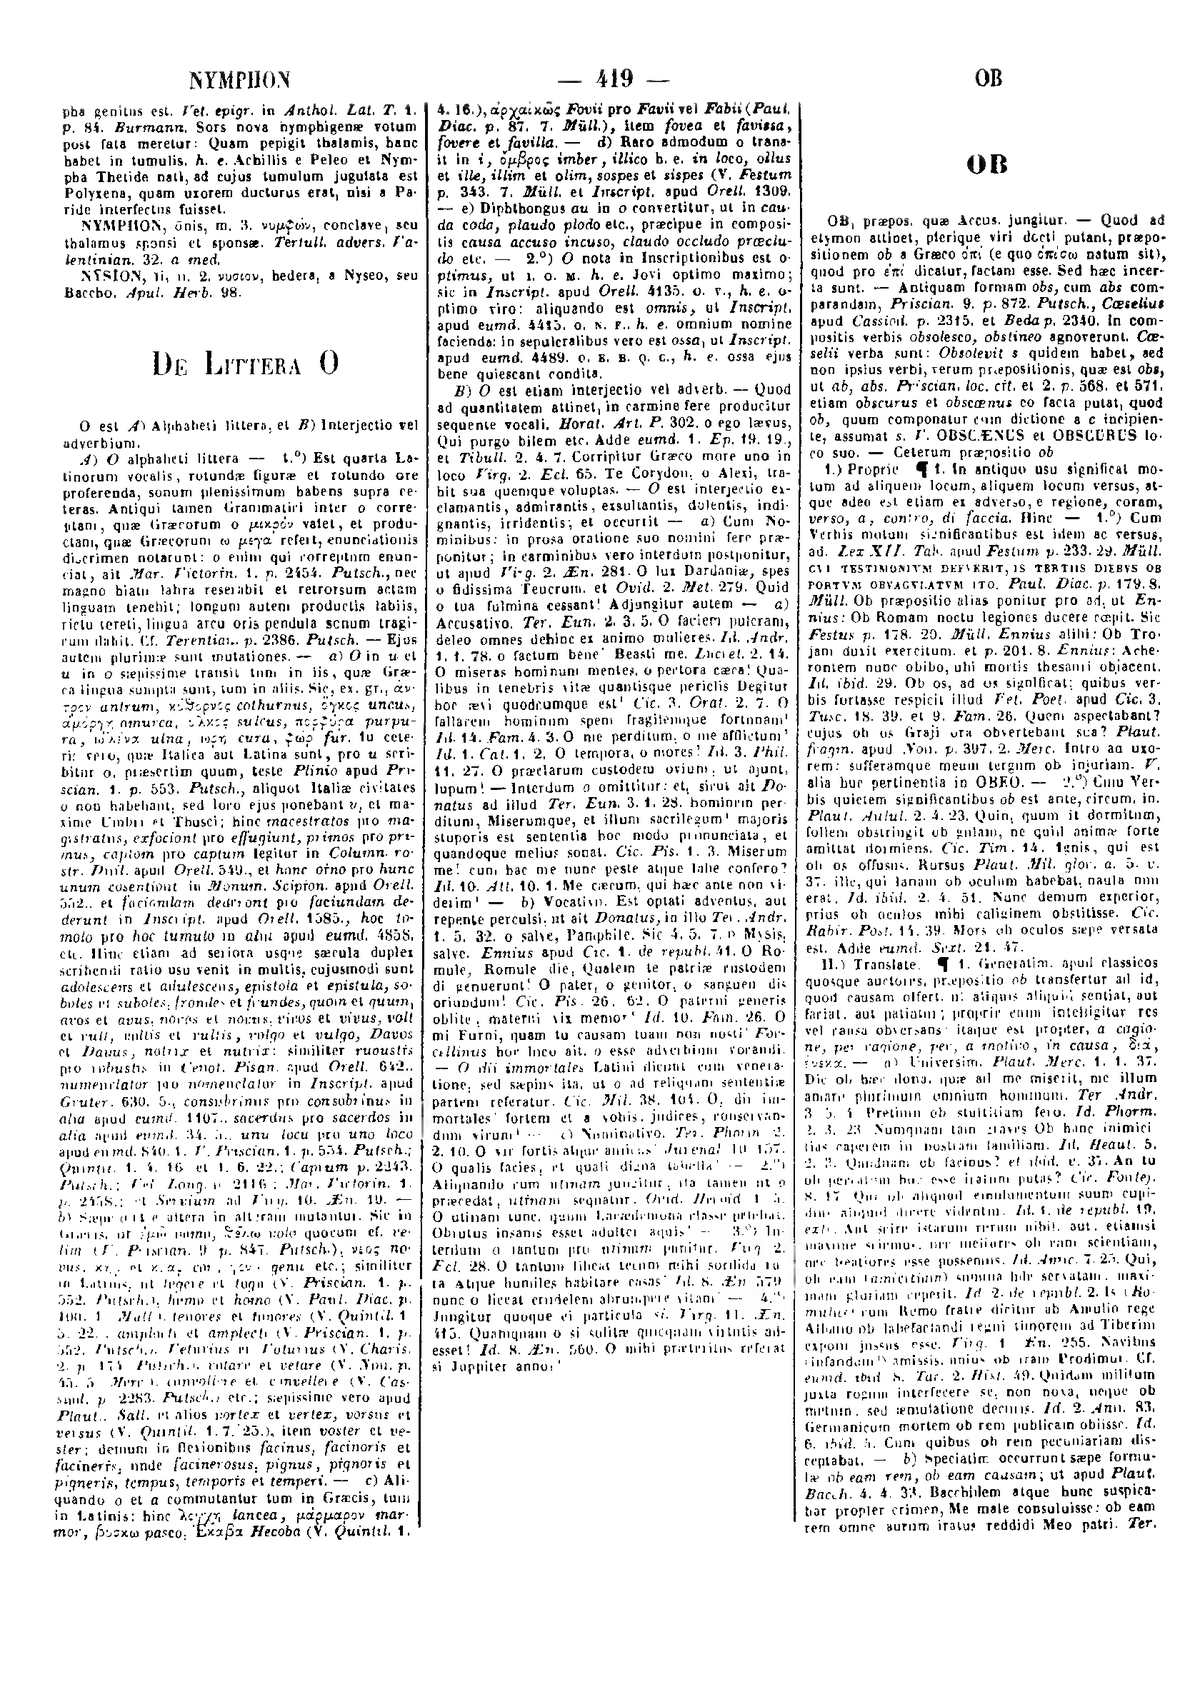 296713e6493806 Calaméo - Lexicon totius latinitatis O Po Forcellini Aegidio, Corradini  Franciscus, Perin Josephus, 1940